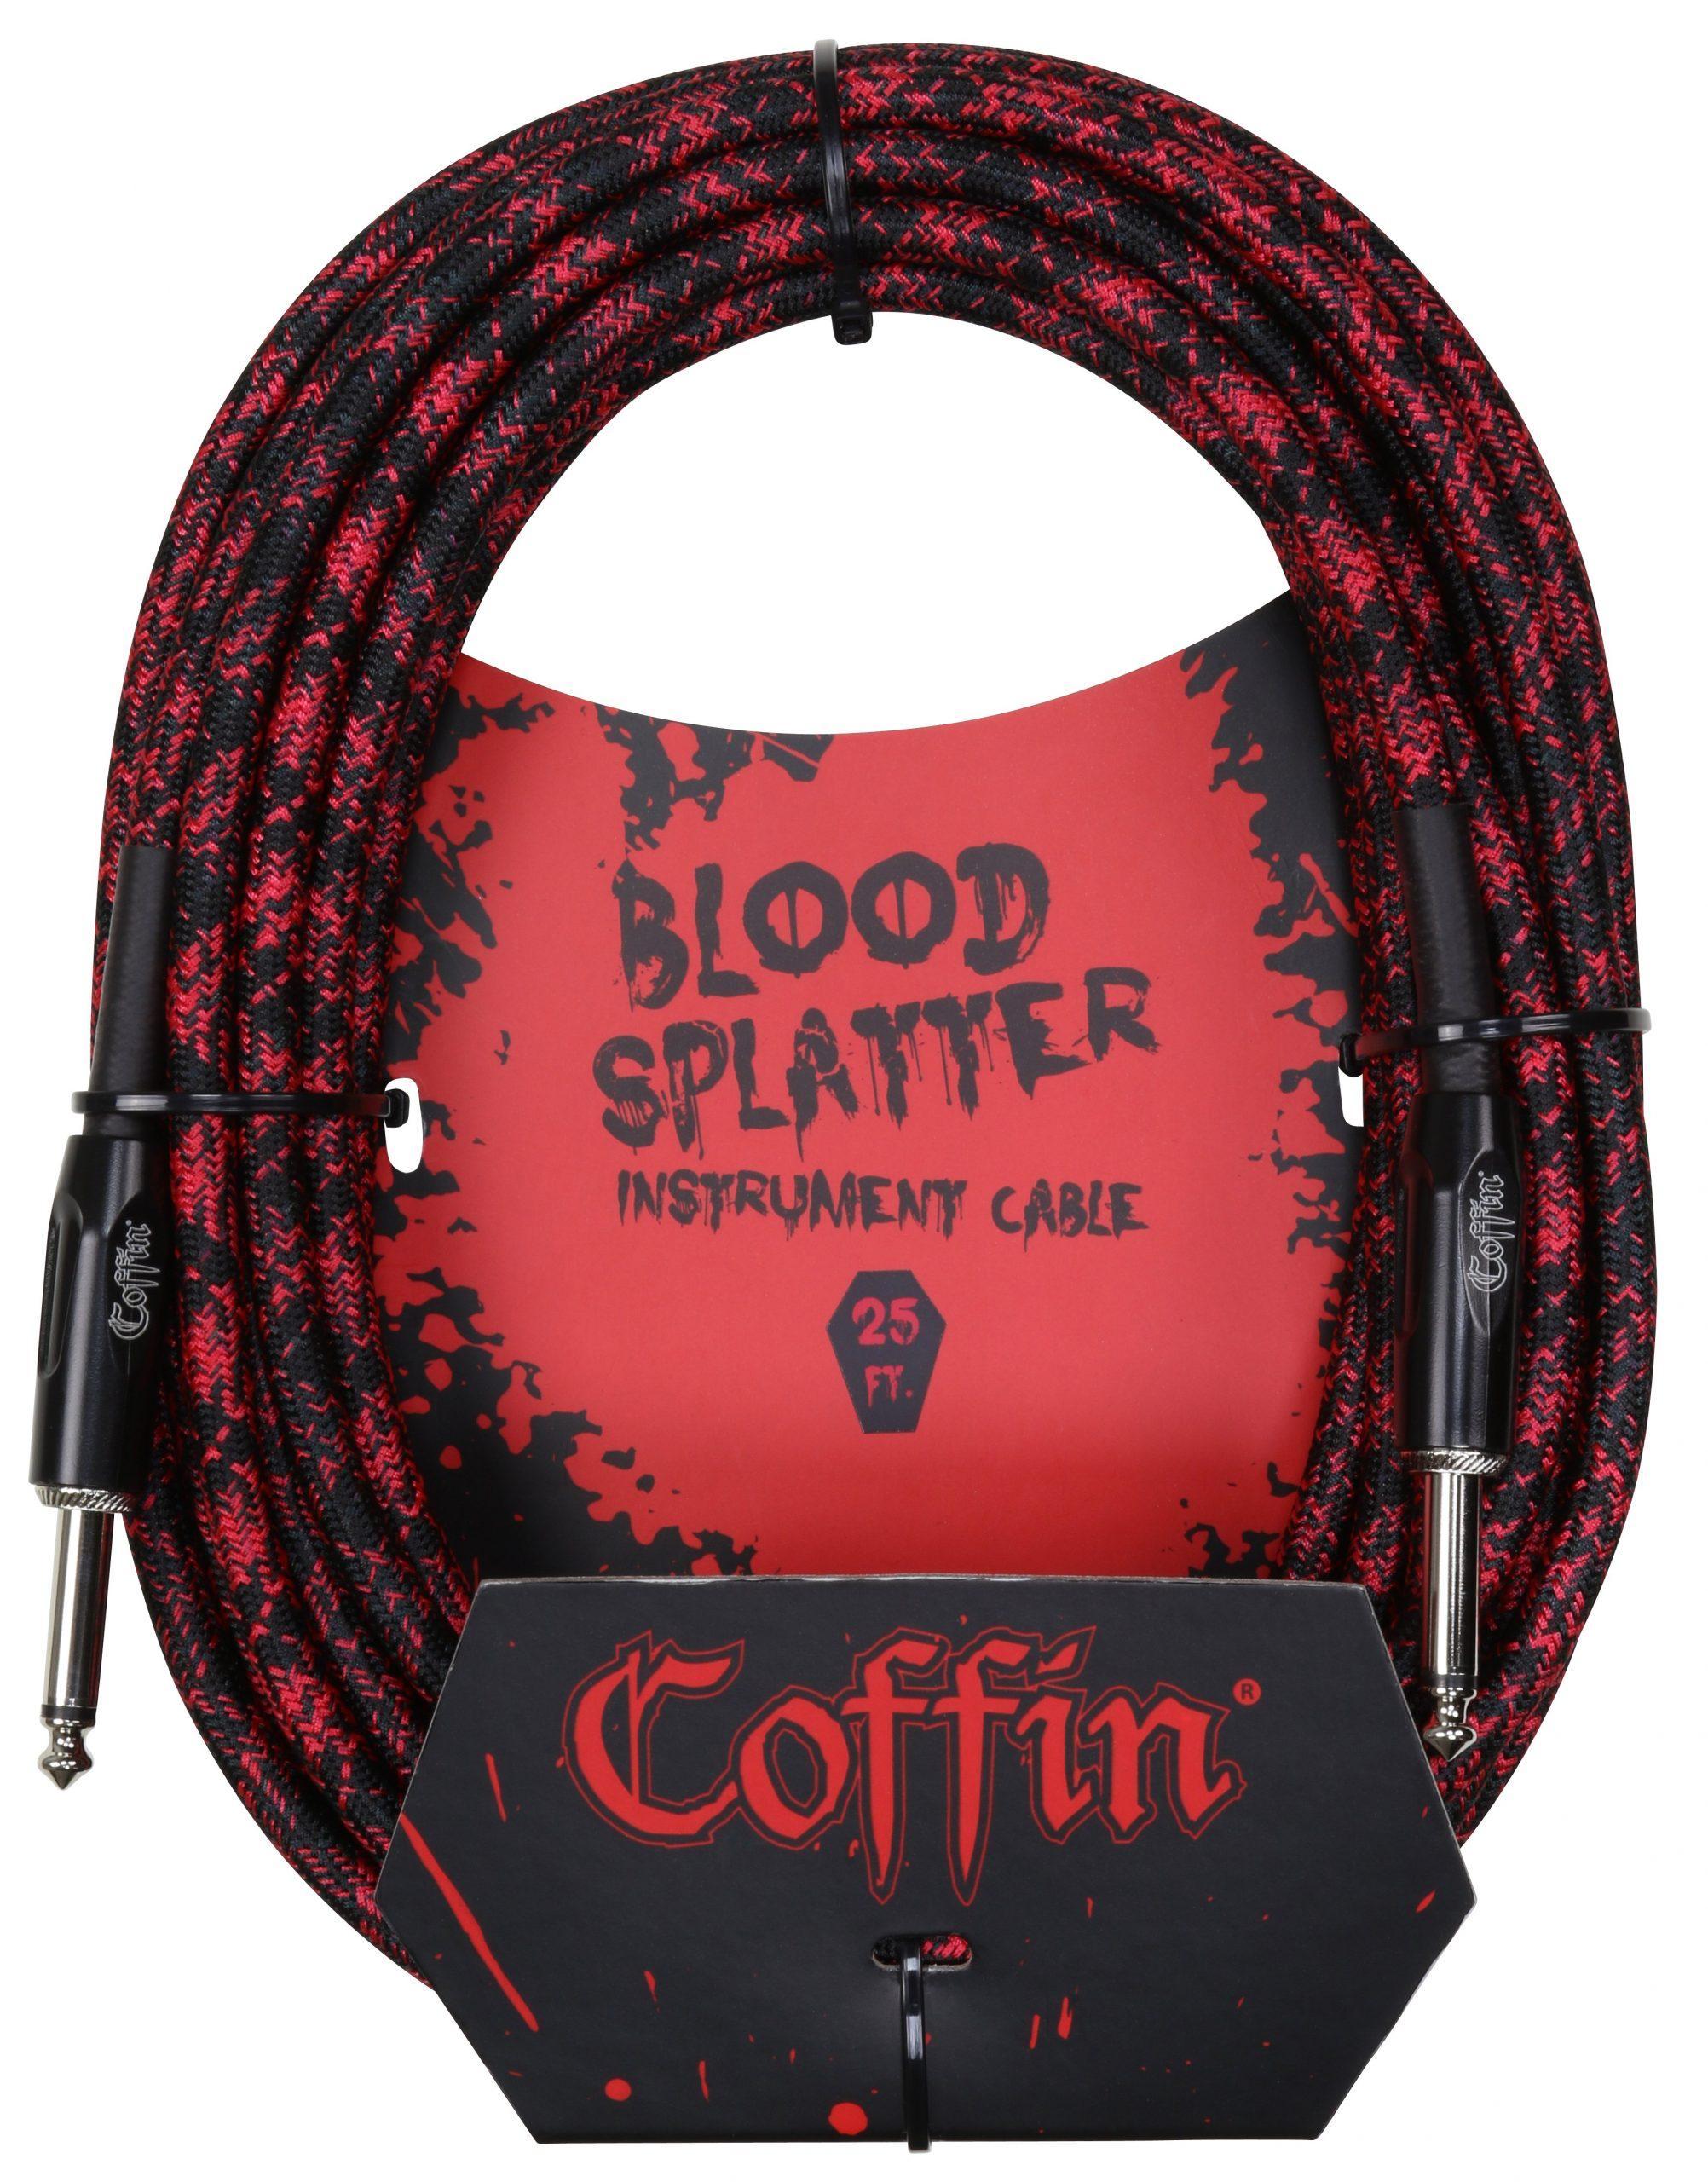 Bloodsplatter Instrument Cable 25ft. Straight